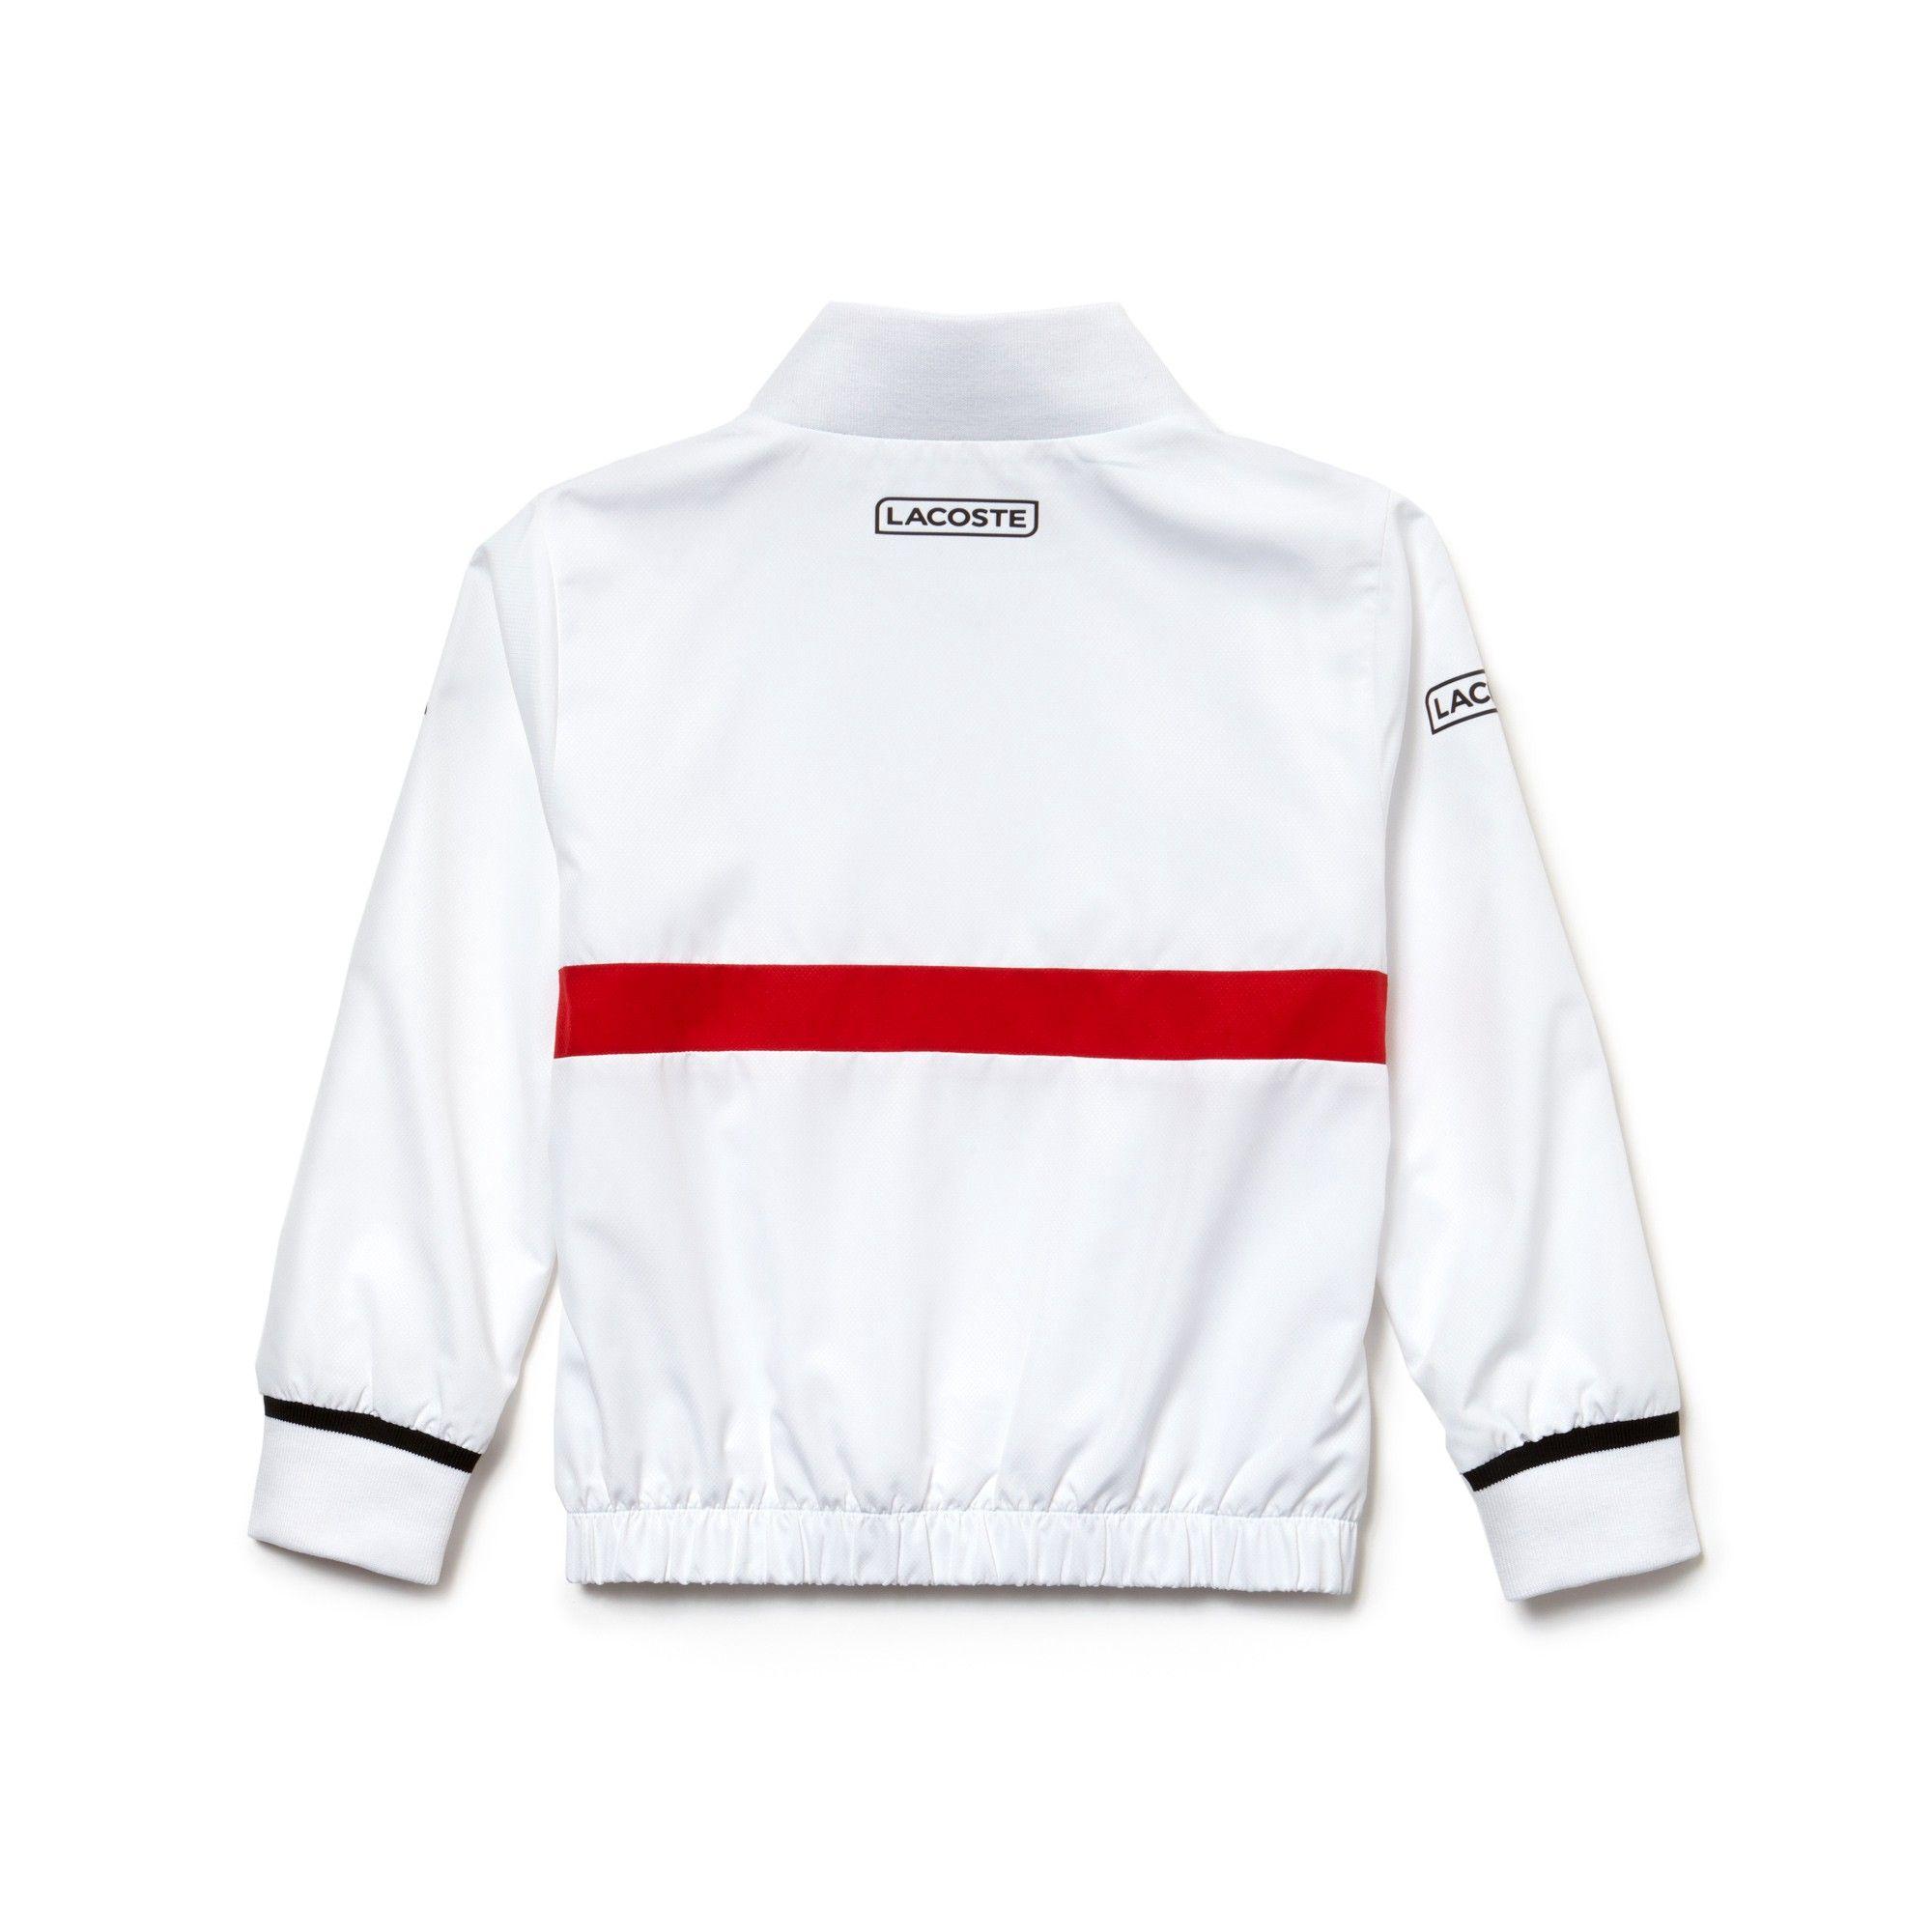 24c52f5e05ffb3 Lacoste Boys  Sport Tracksuit - Novak Djokovic Collection White Black-Red  10Yr